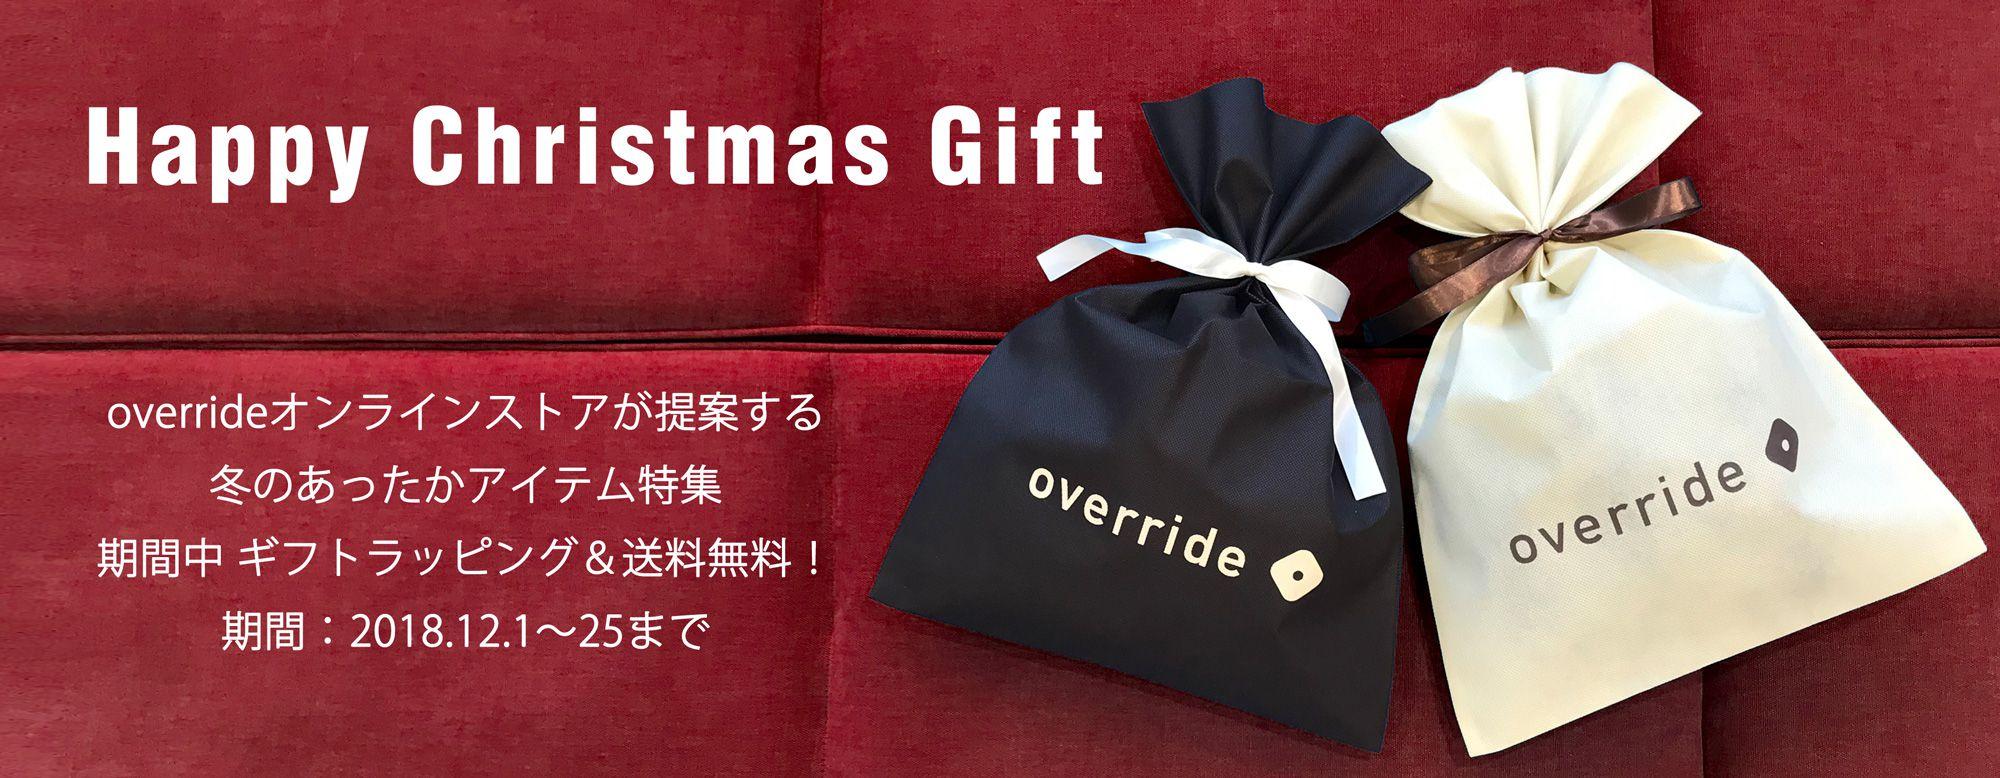 happy christmas gift override オーバーライド online store